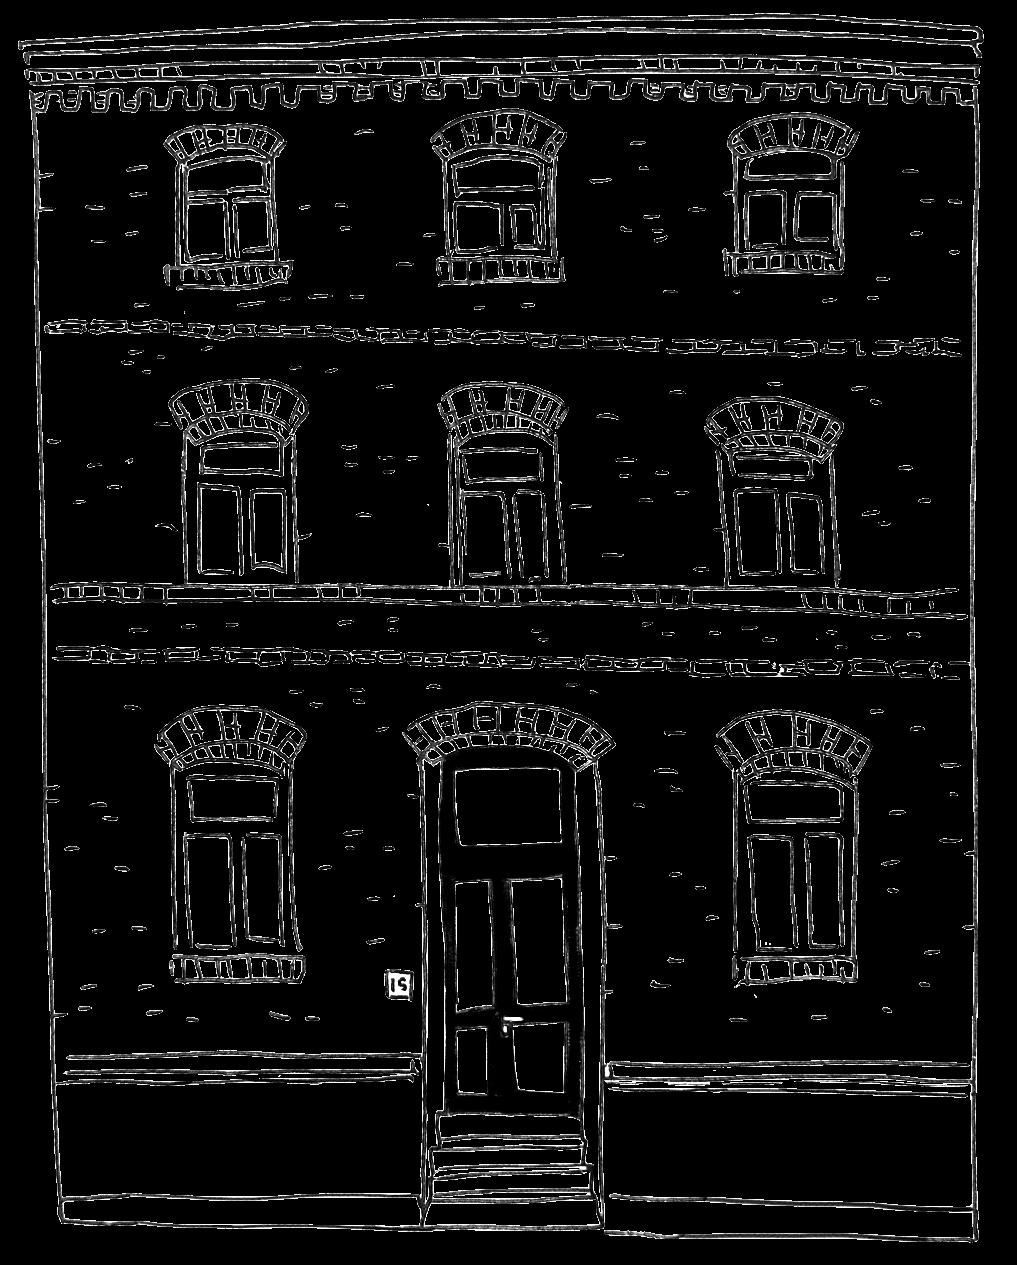 VN Residency entrance building sketch drawing